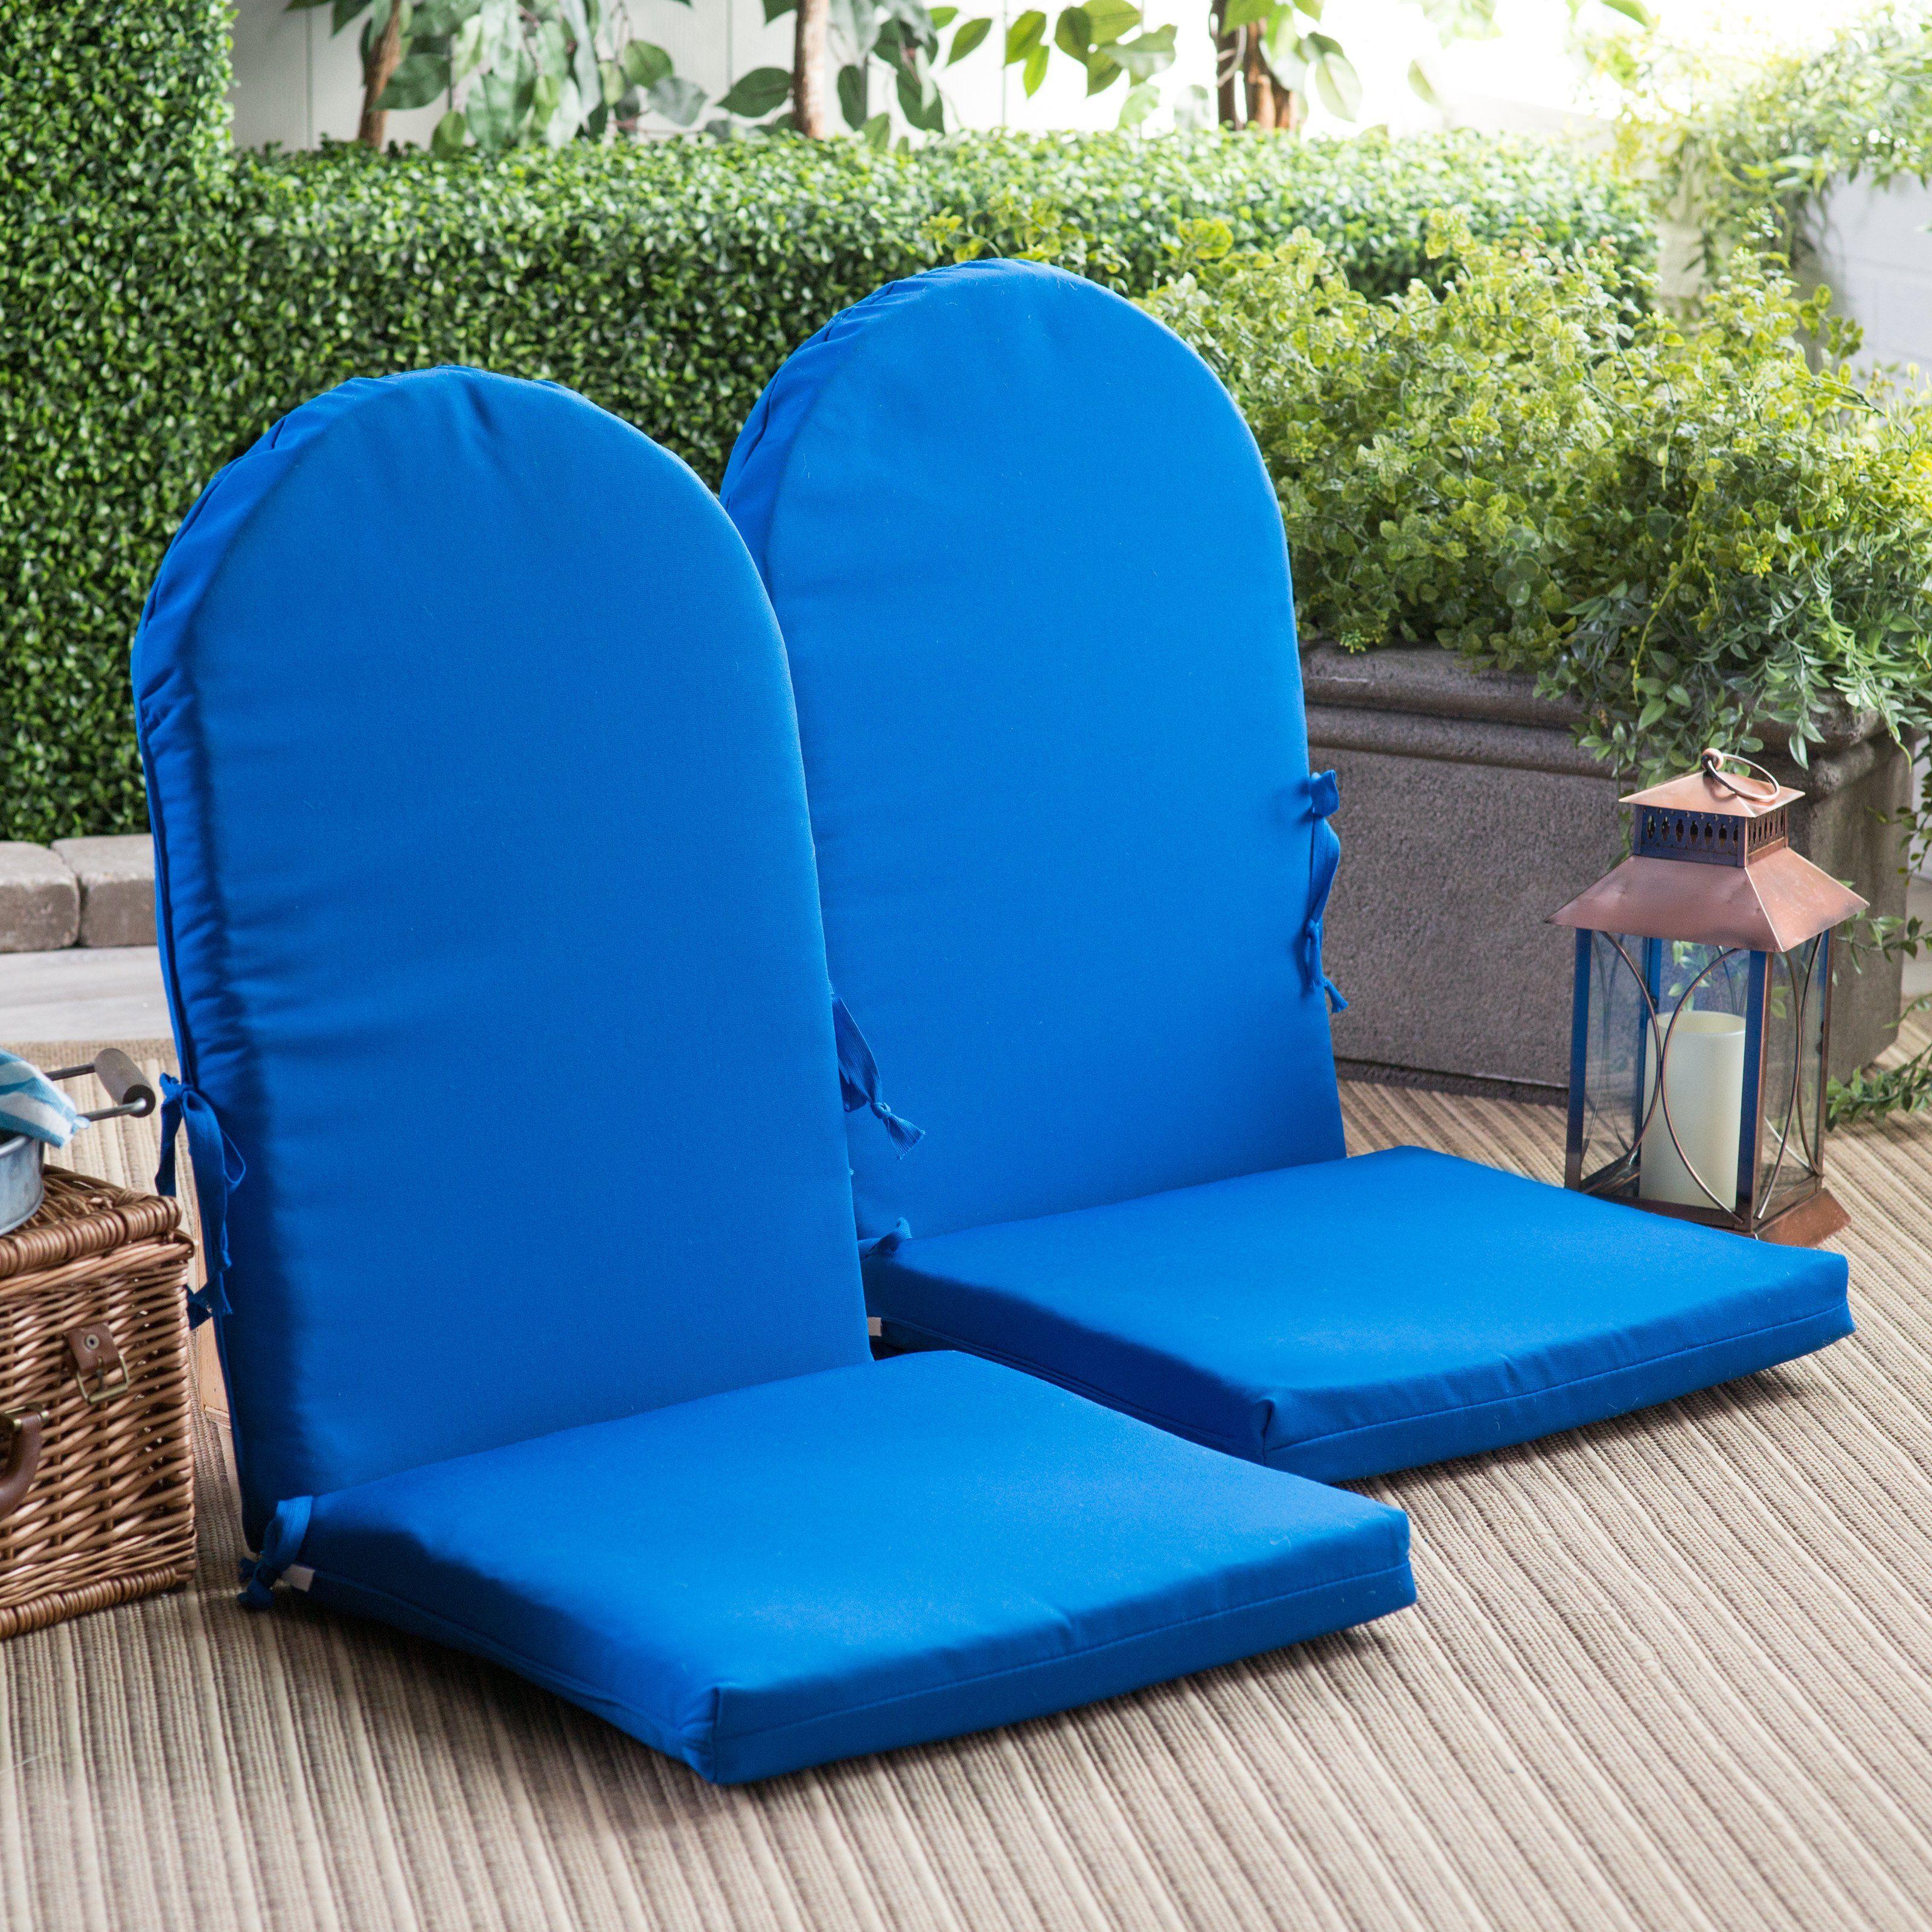 Polywood Sunbrella 46 X 40 In Adirondack Chair Cushion Masones